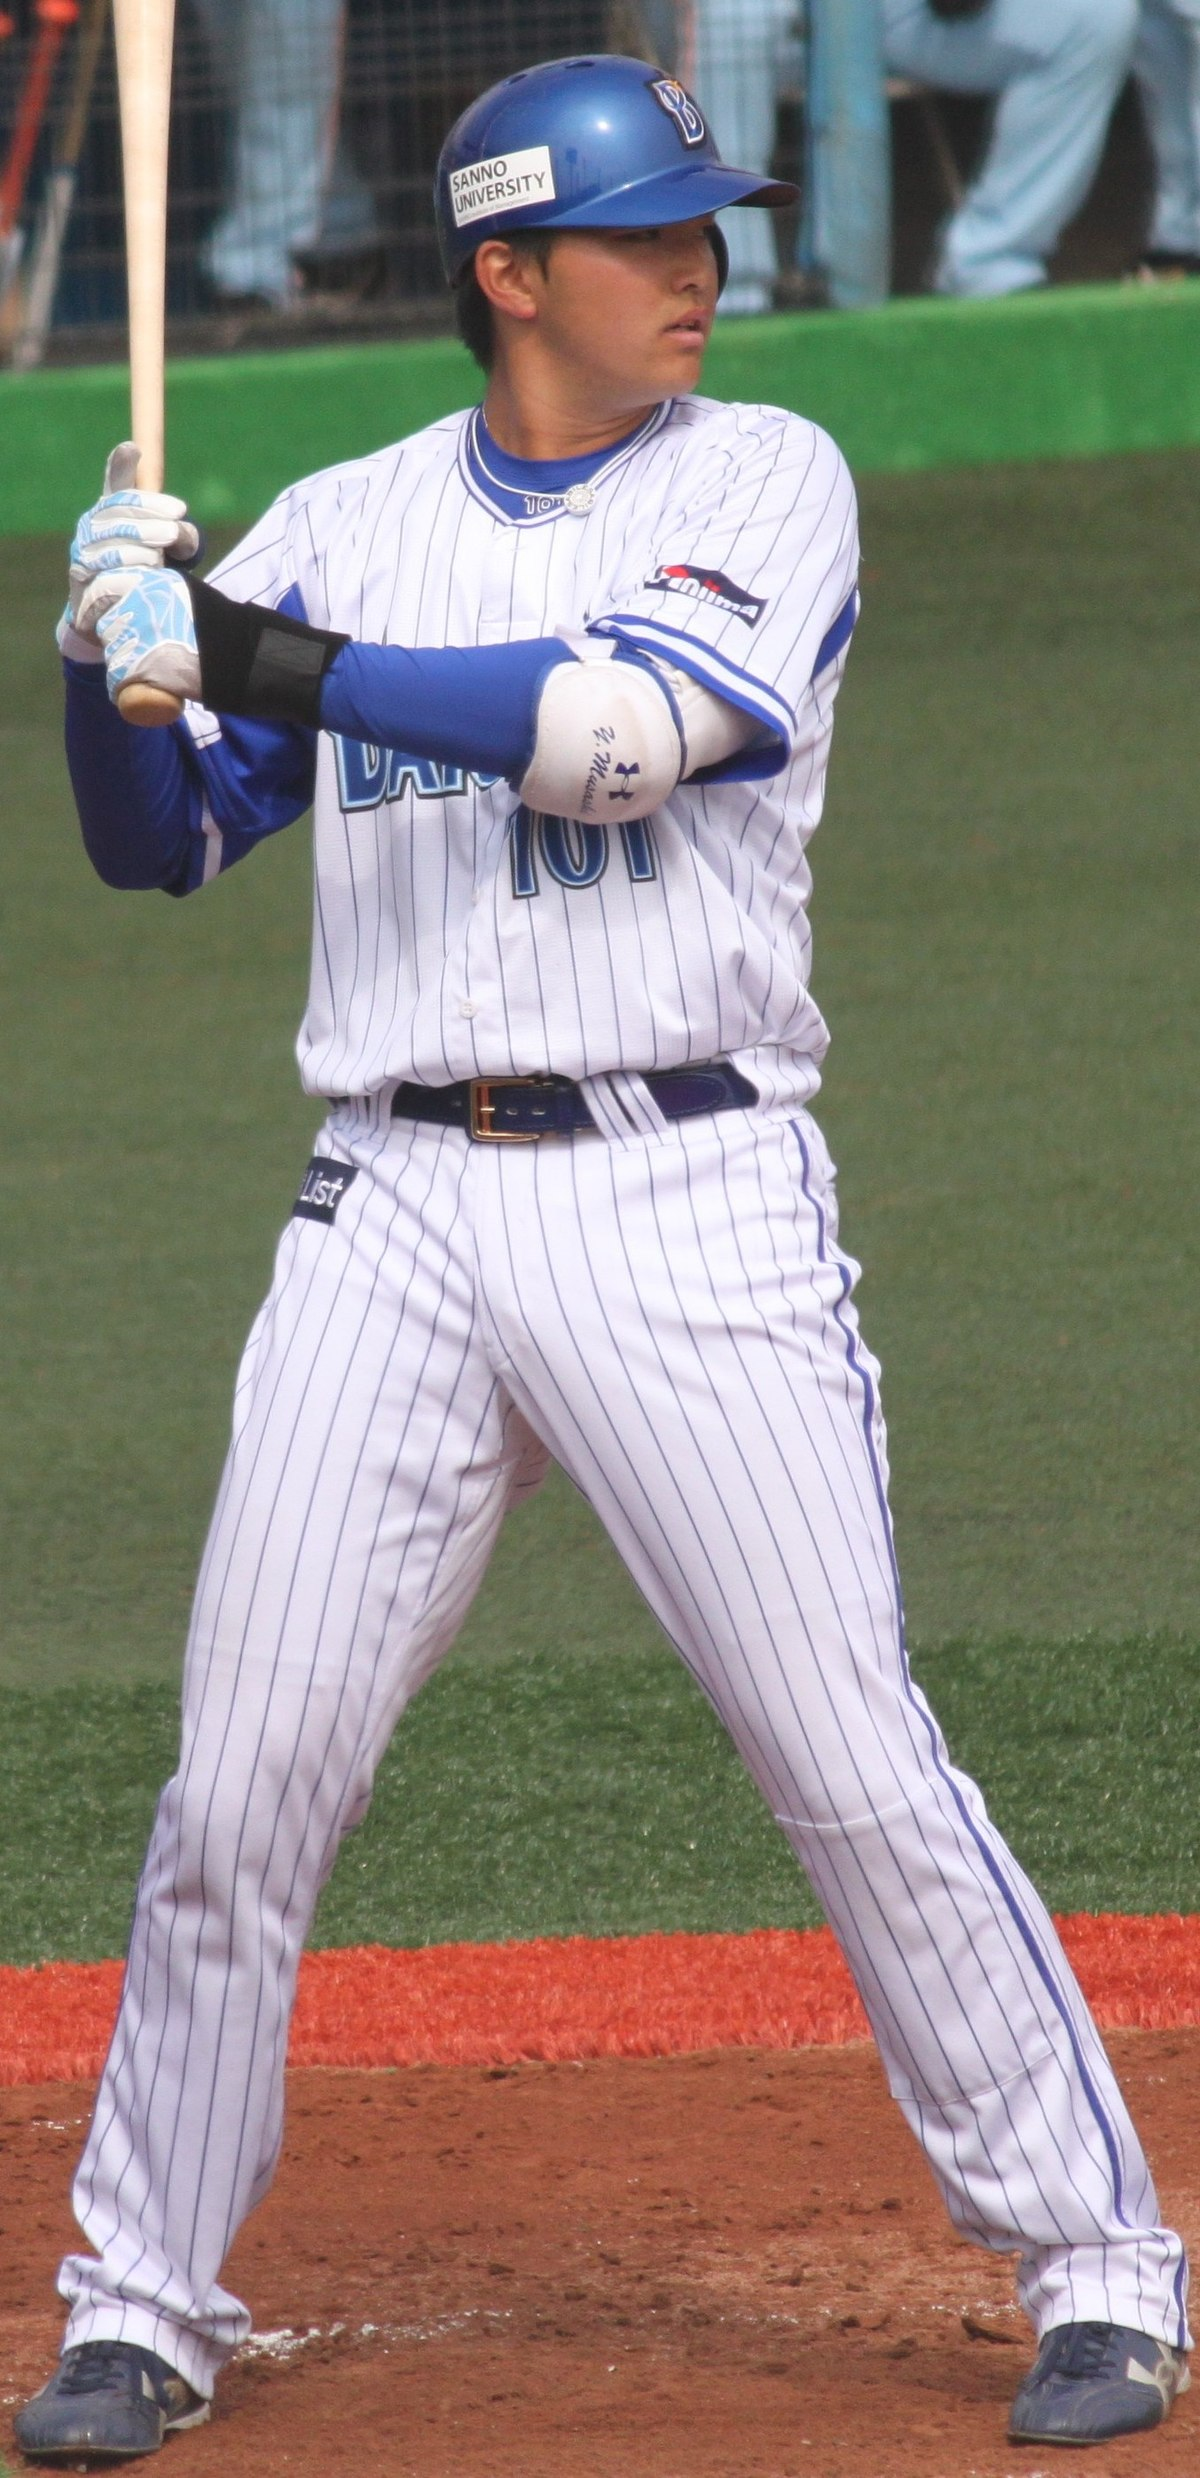 山本武白志 - Wikipedia